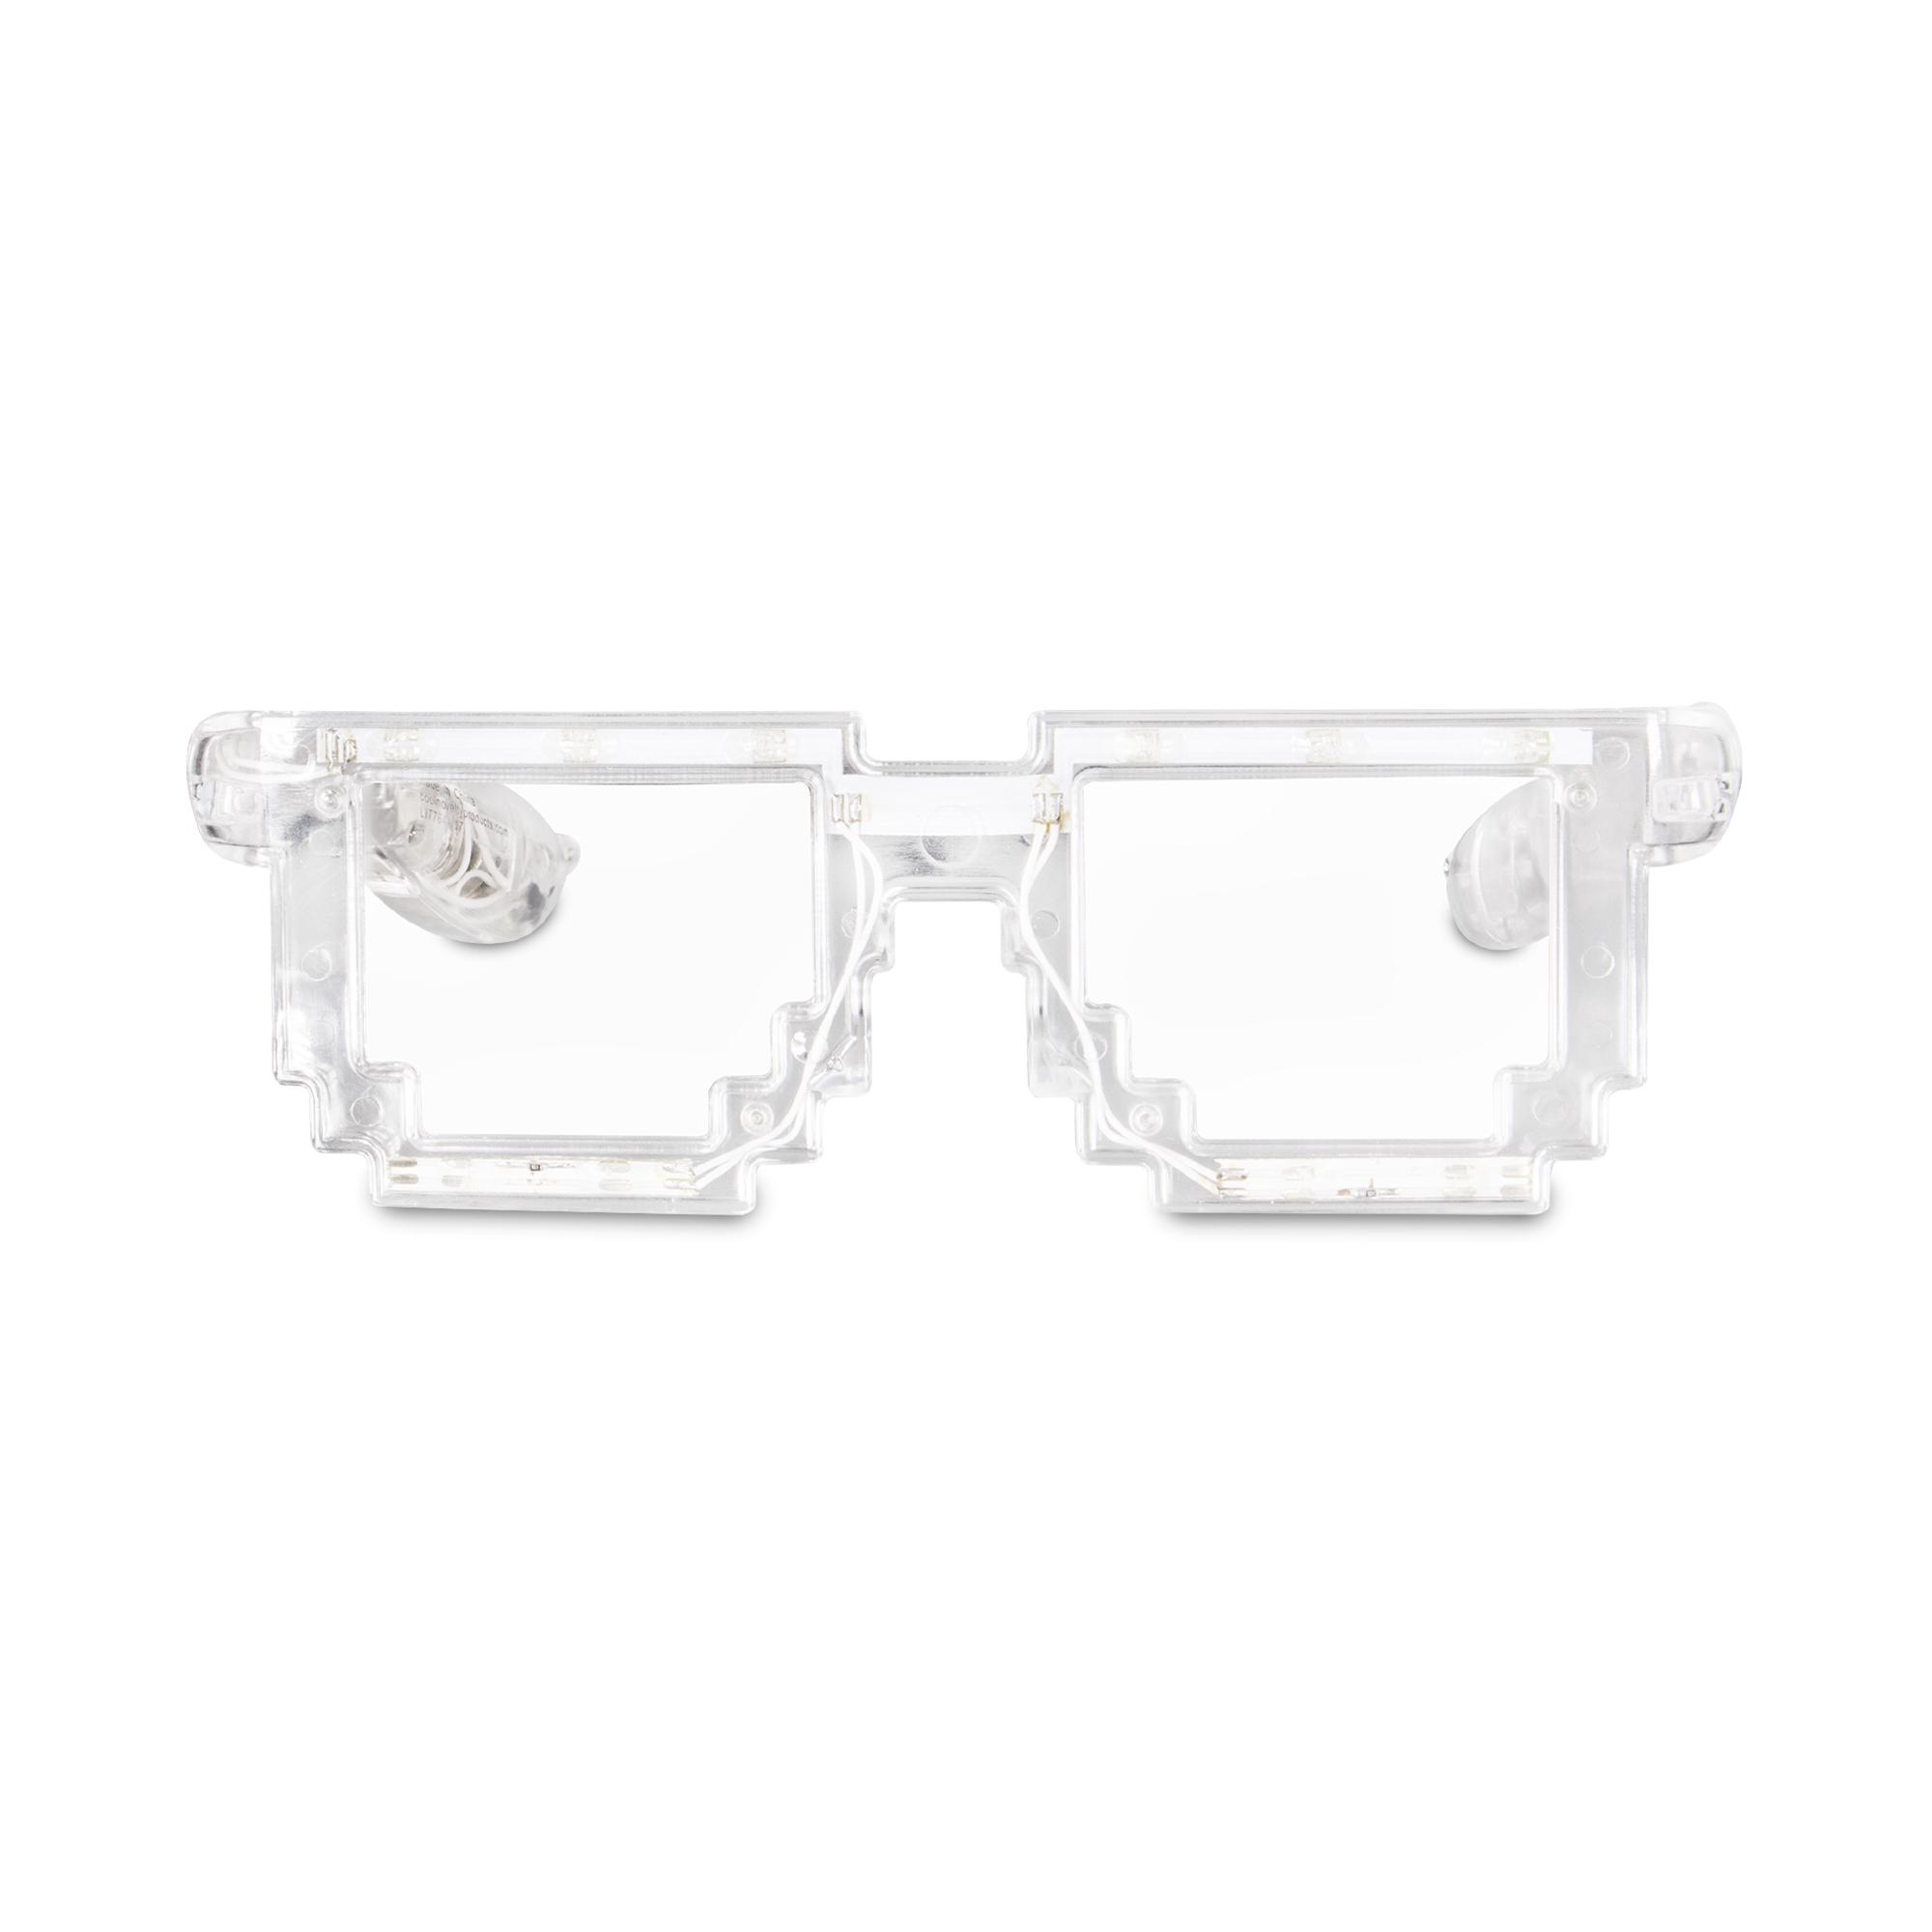 Led Pixel Eyeglasses